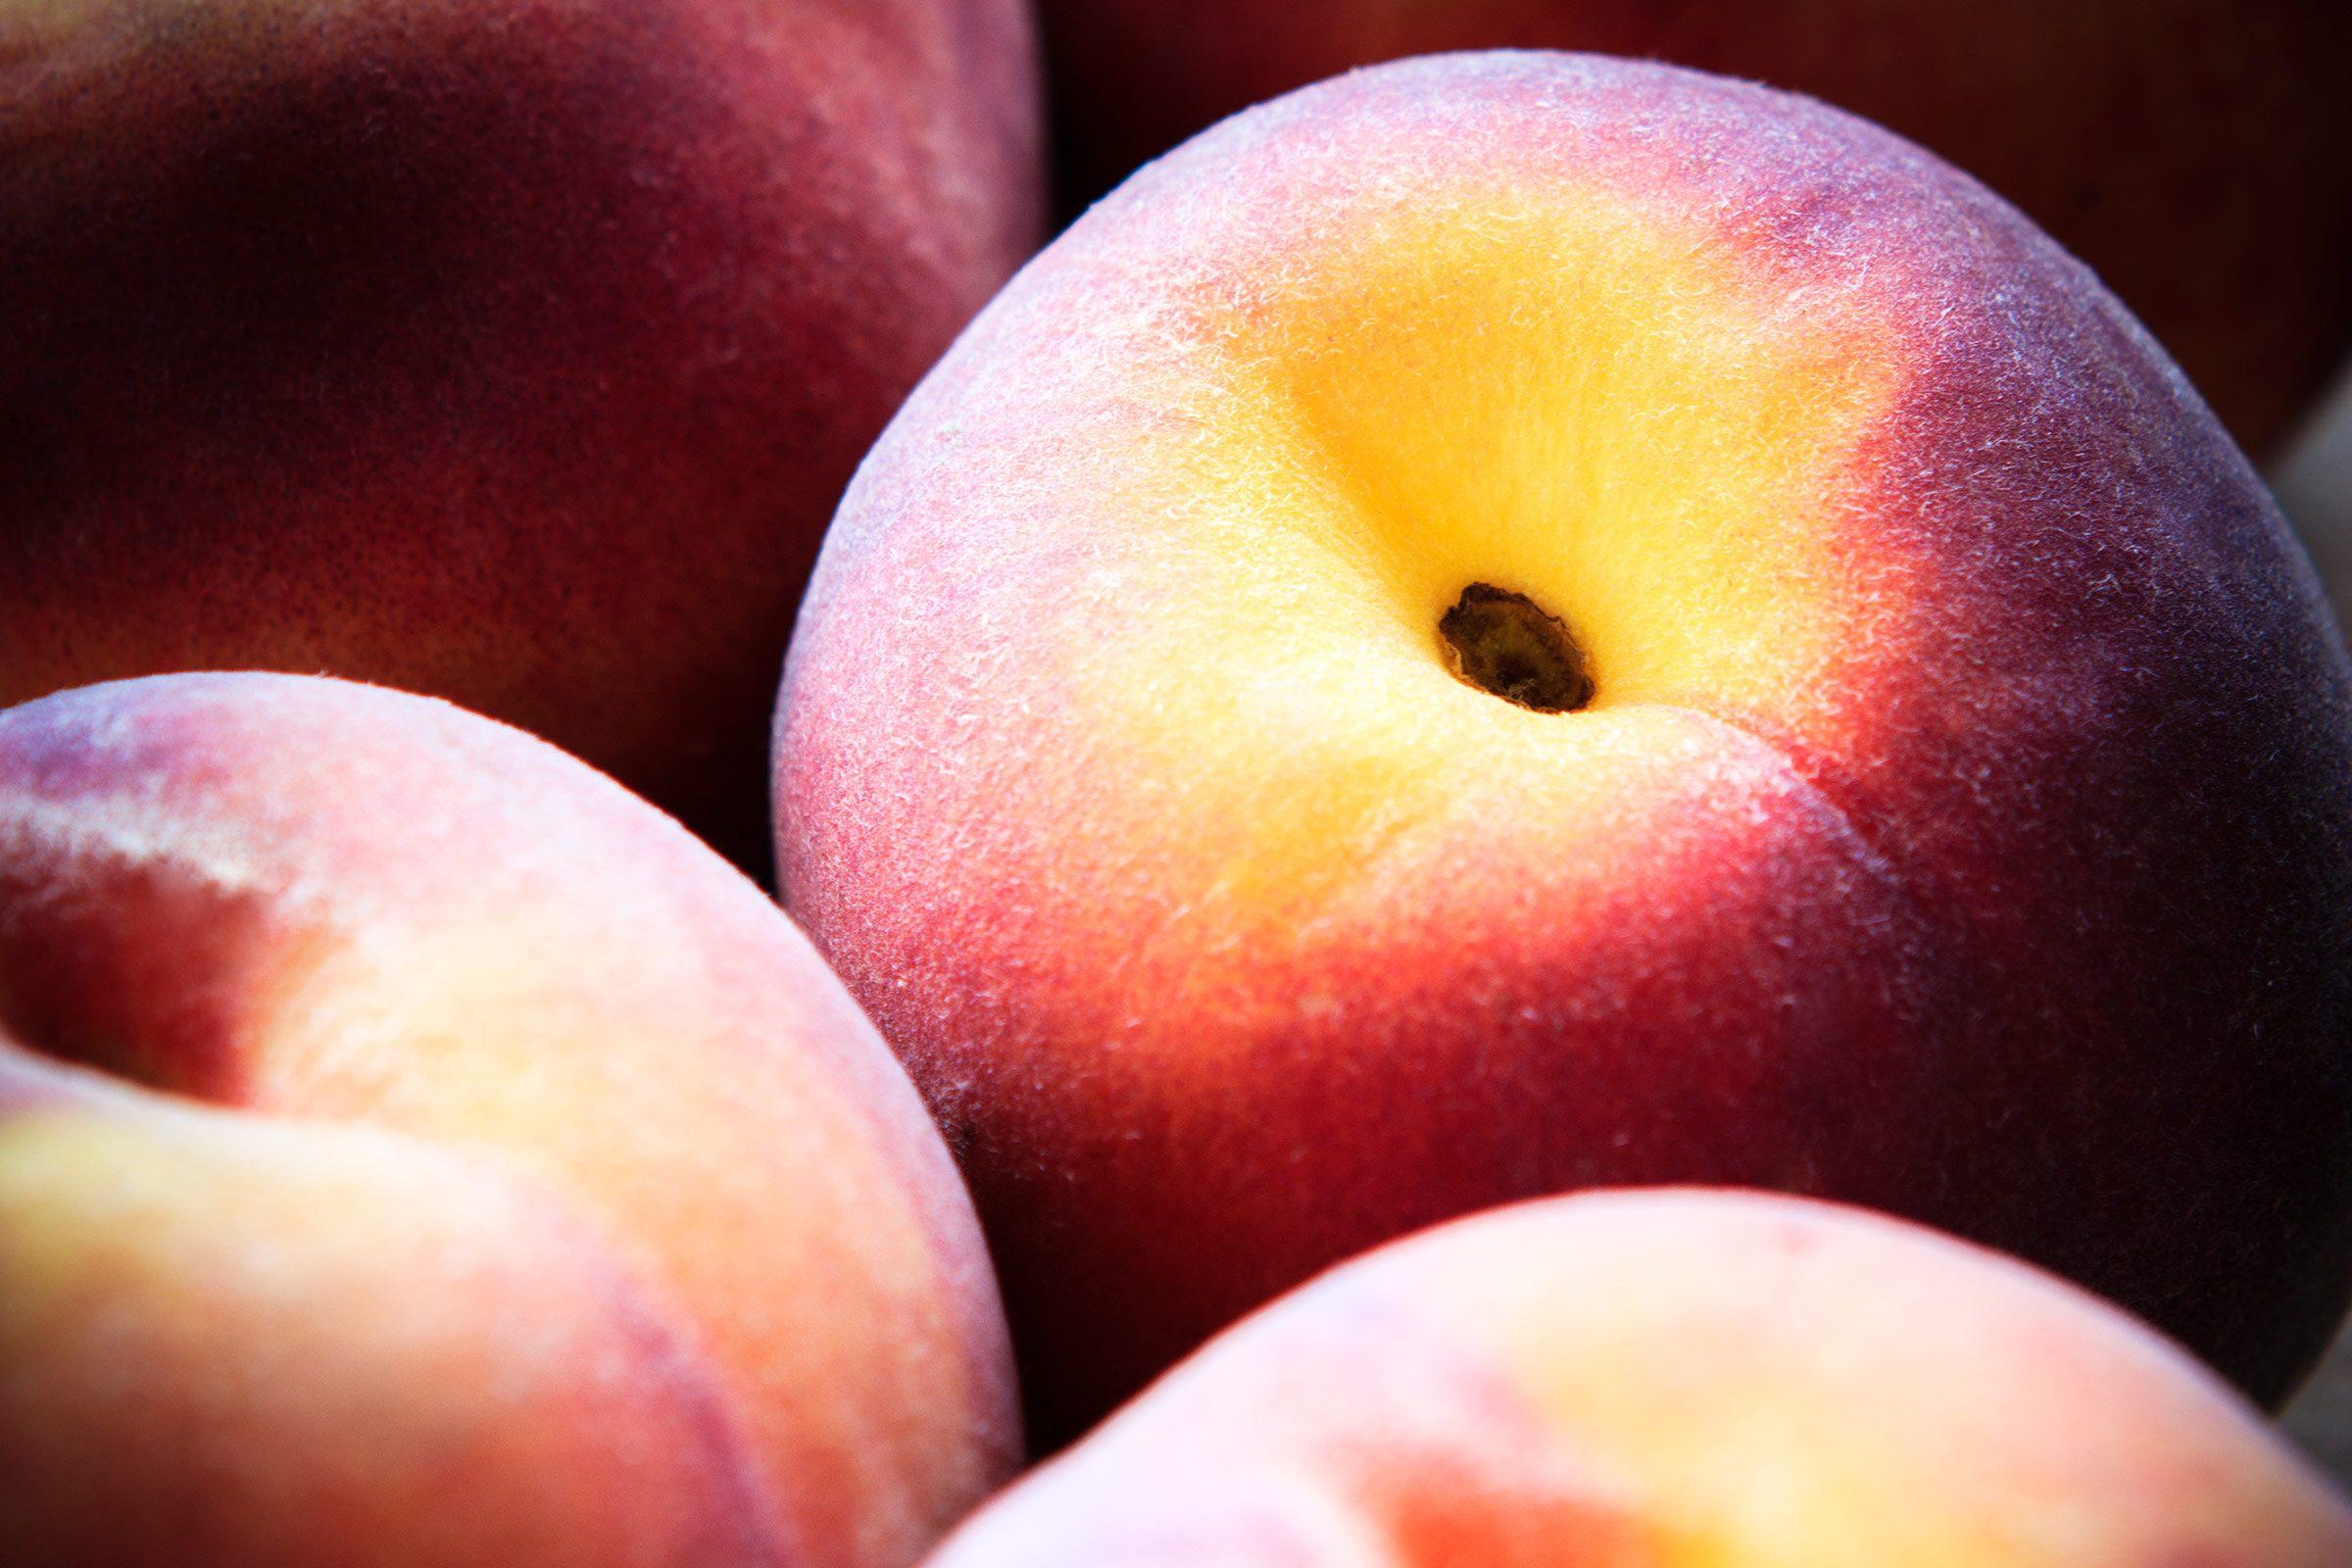 7. Fresh fruit or dried?